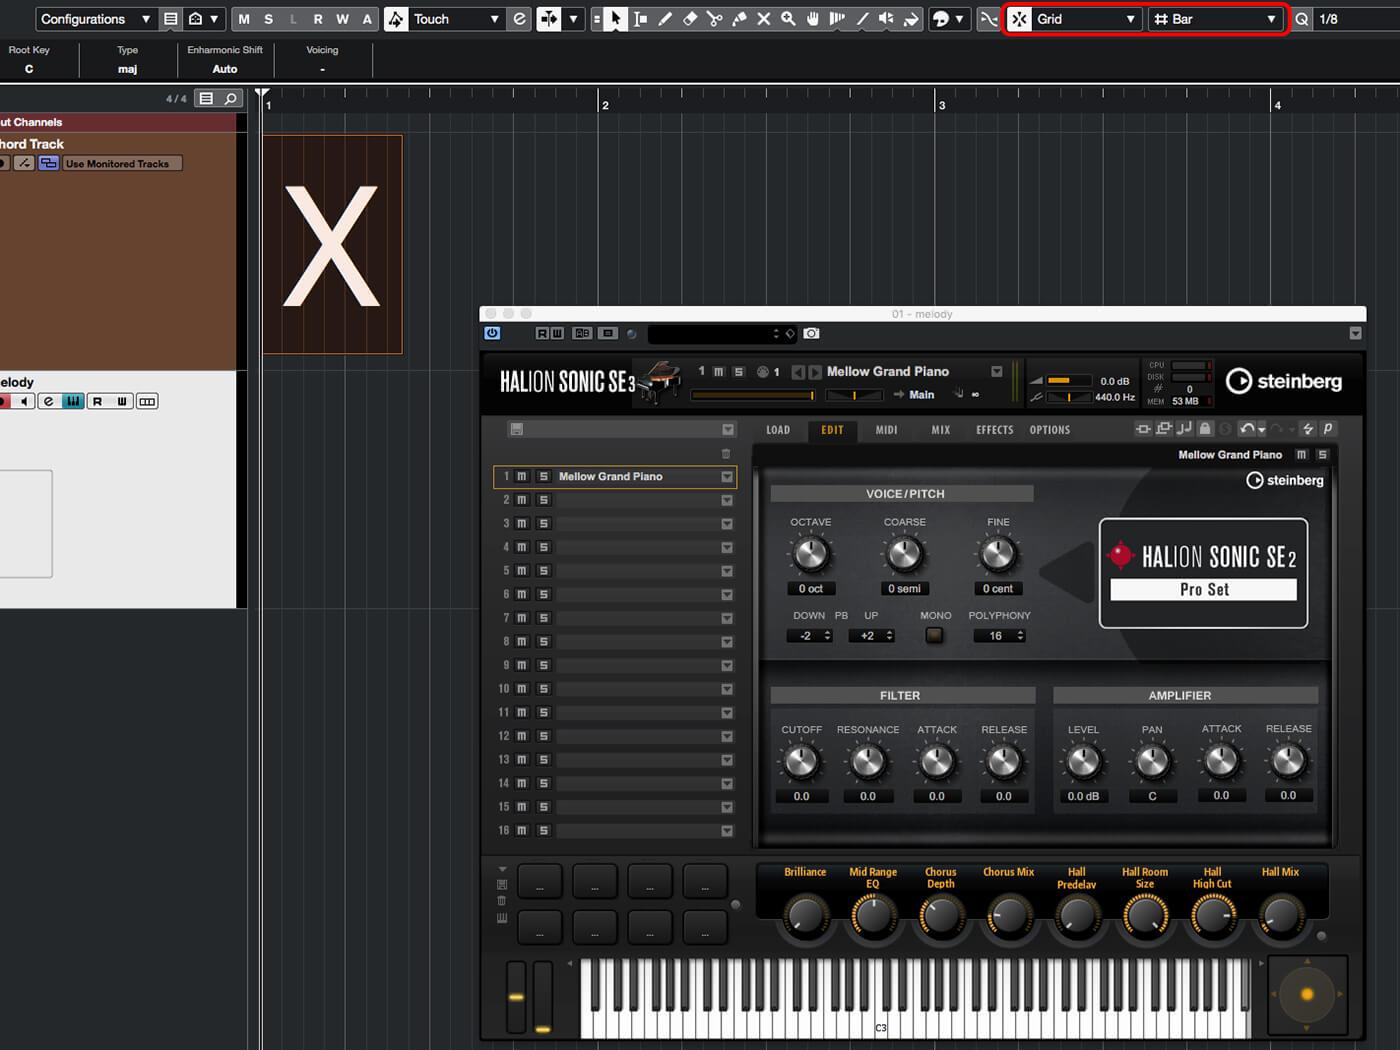 MT 205 Cubase Score Editor Step 2